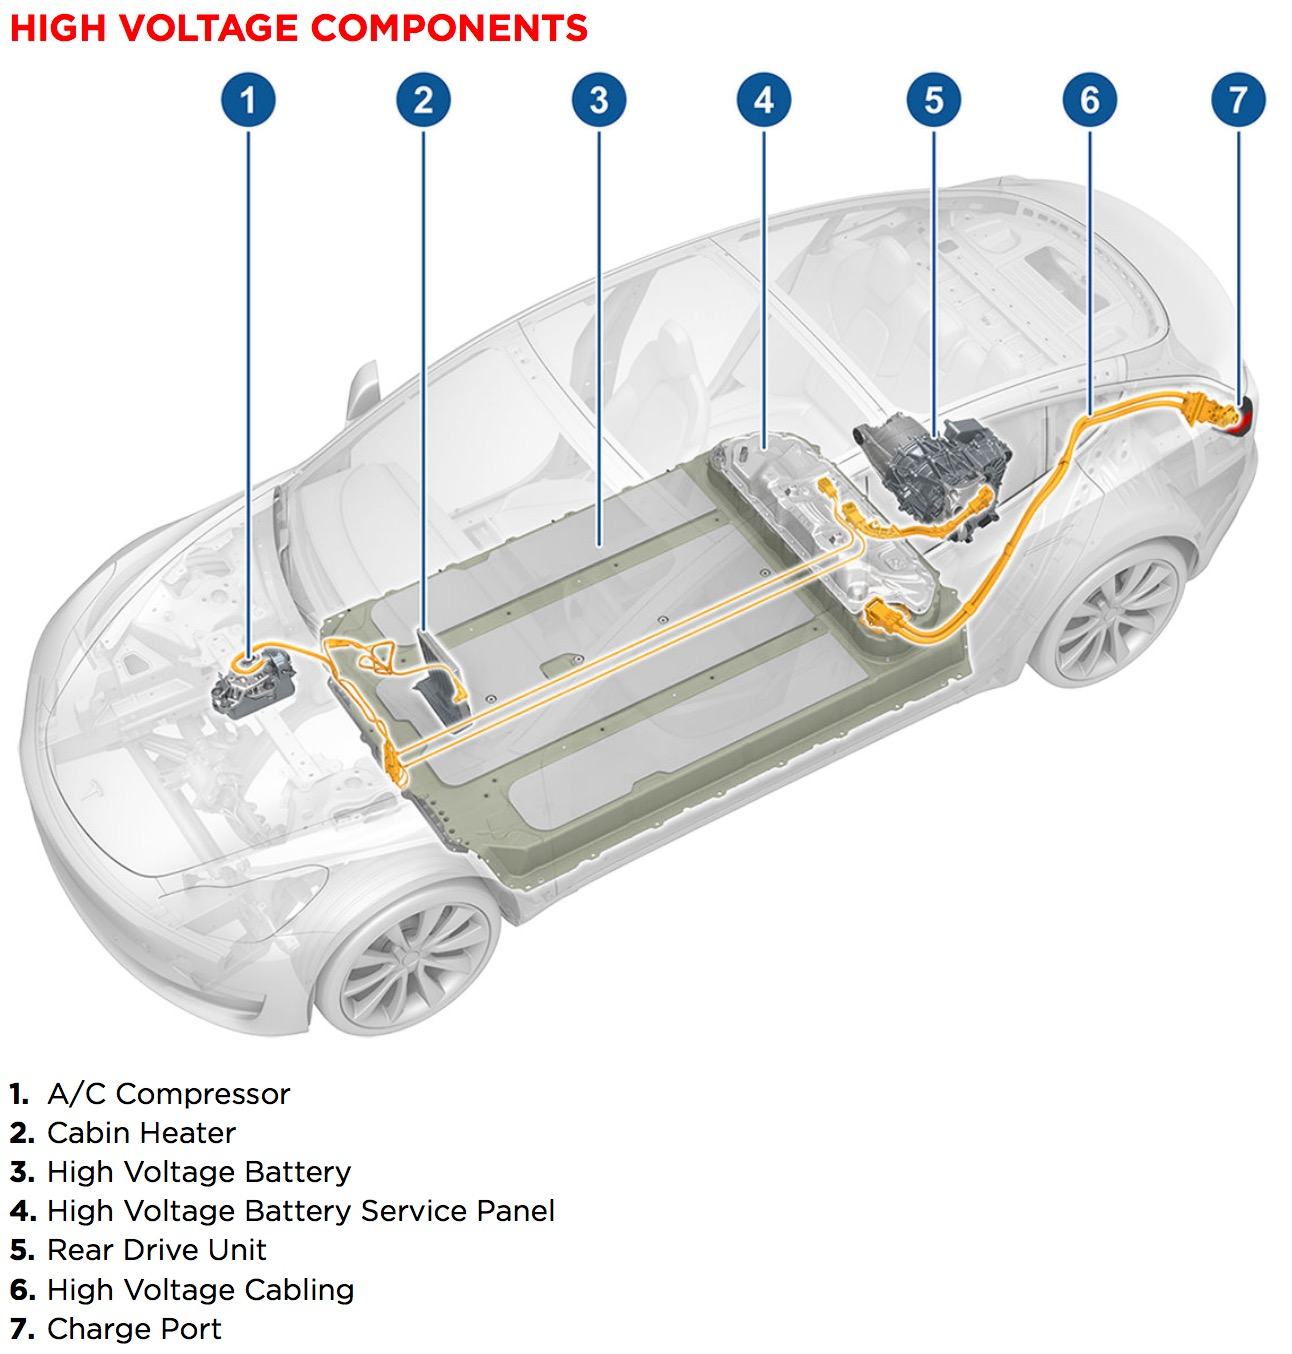 hight resolution of tesla engine diagram wiring diagram sheet tesla electric car engine diagram tesla engine diagram